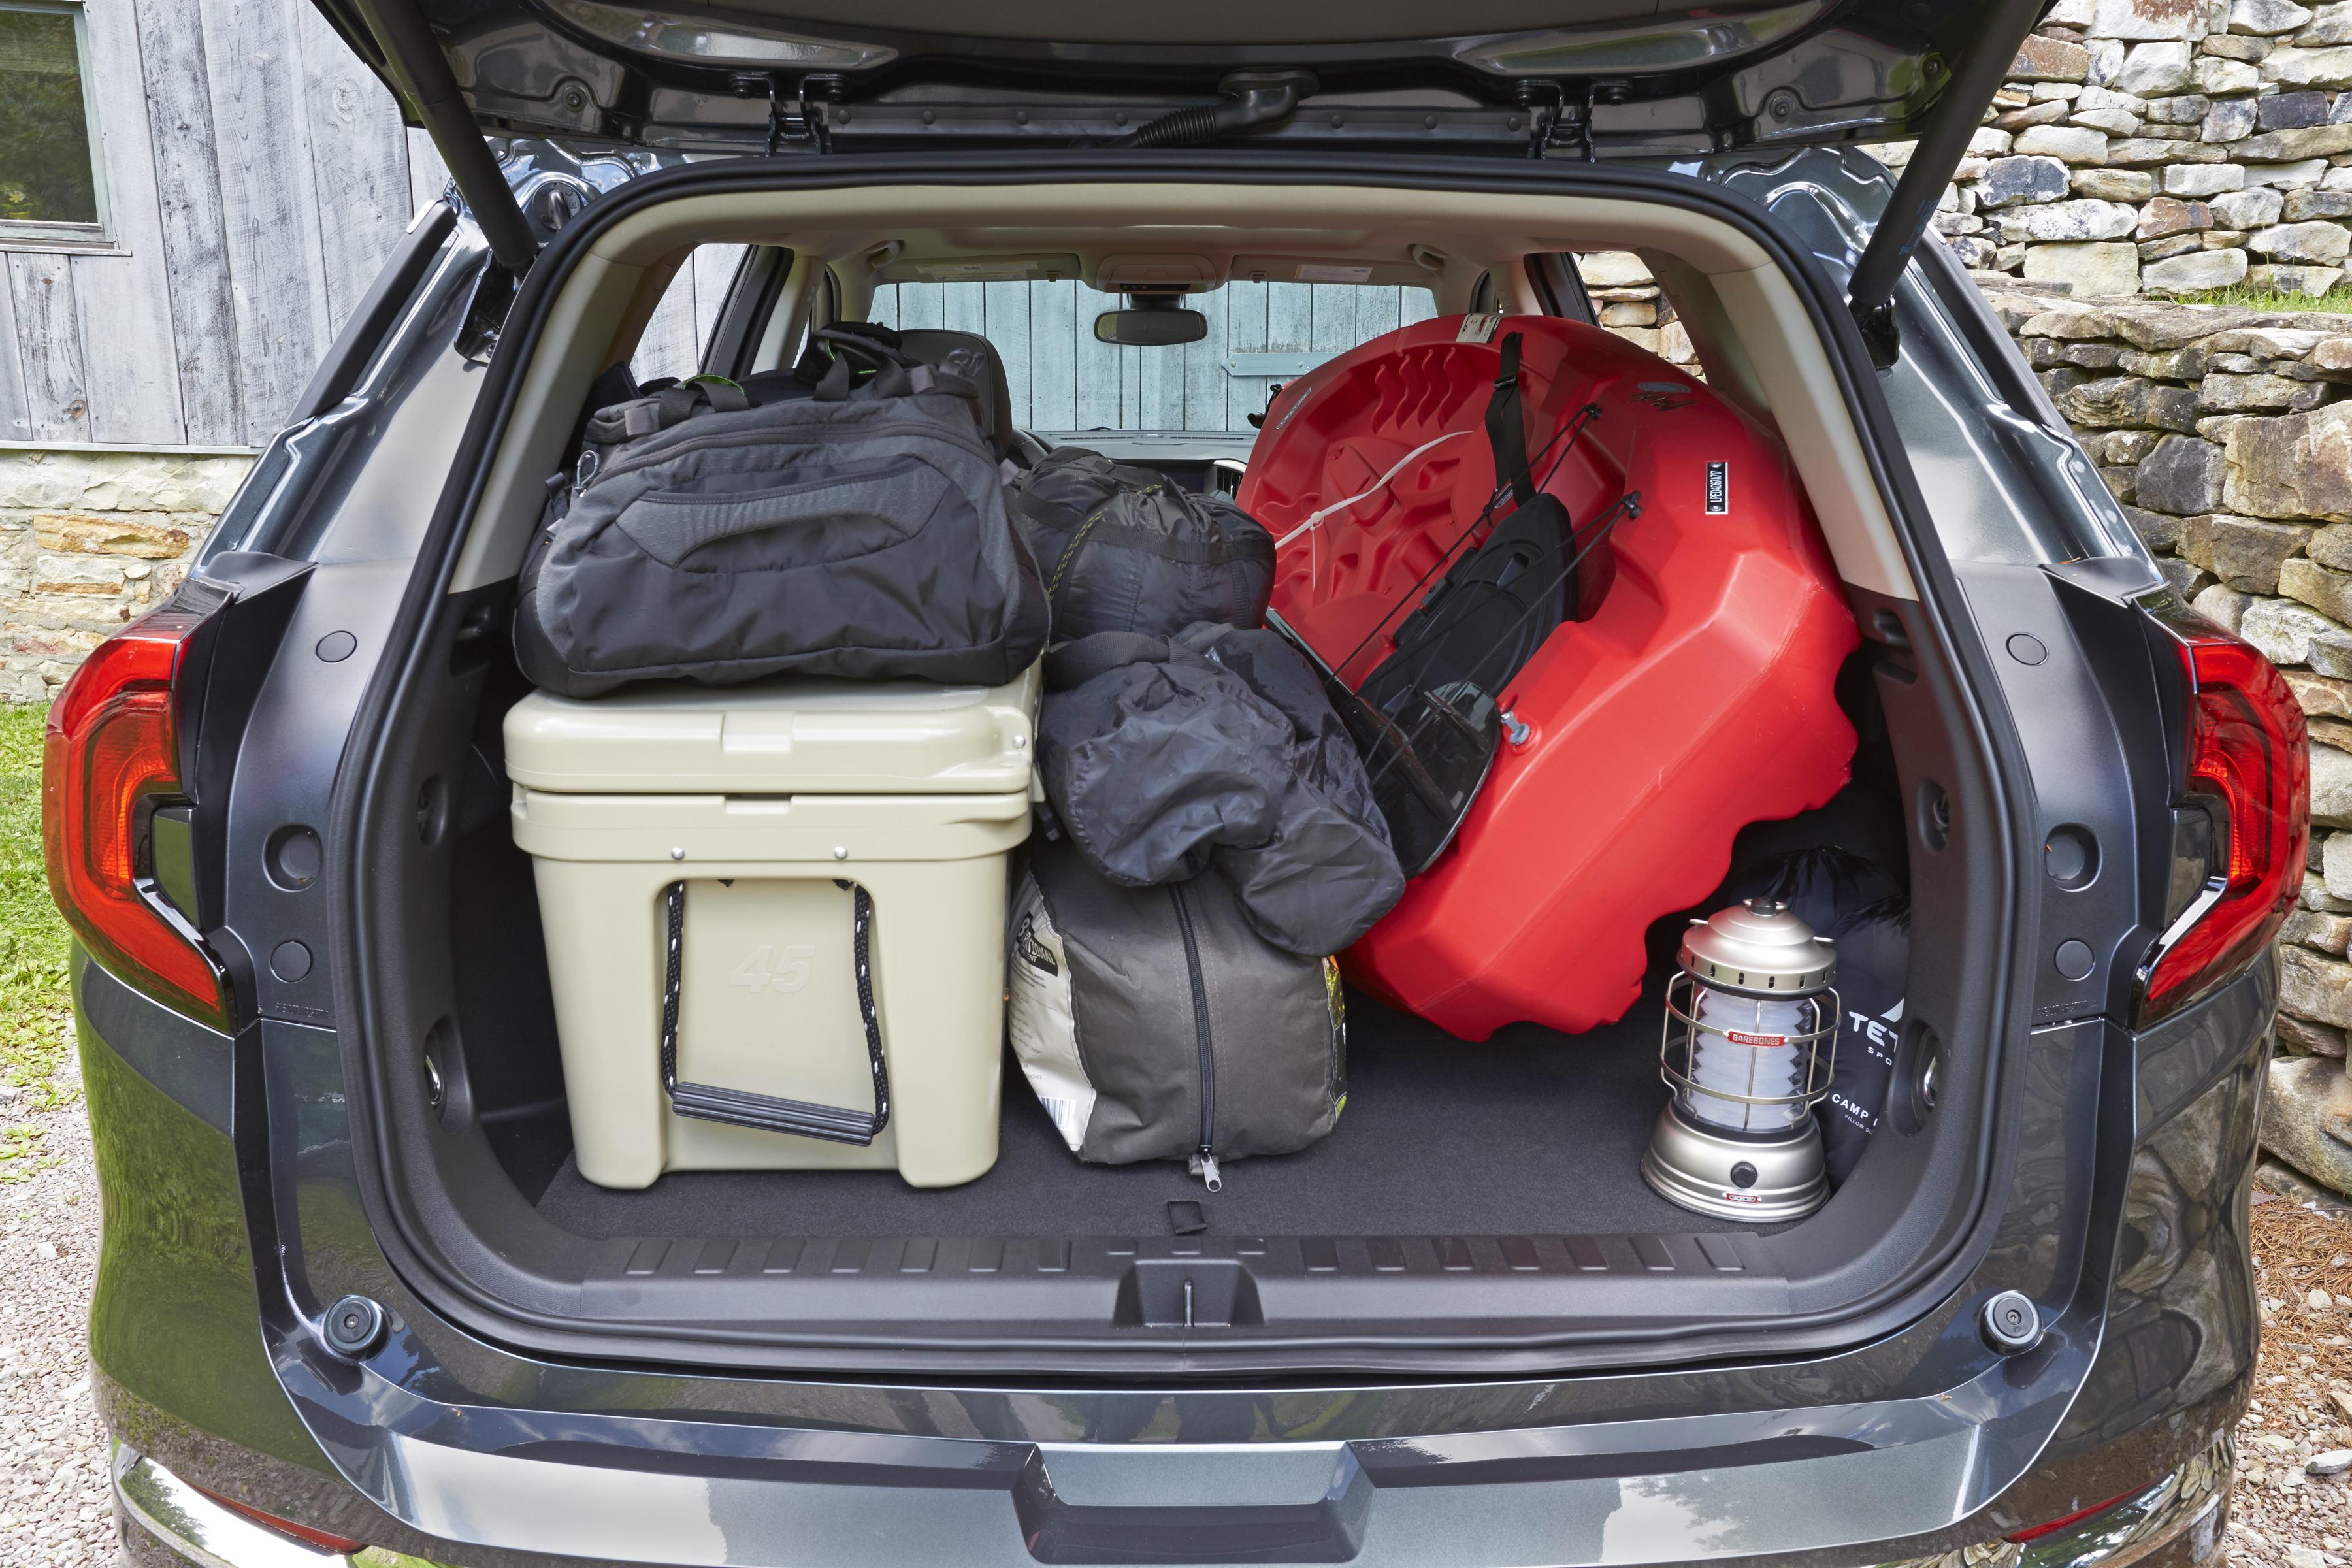 inventory minivan equipment jpg traders chevy van cng img savana ct gmc